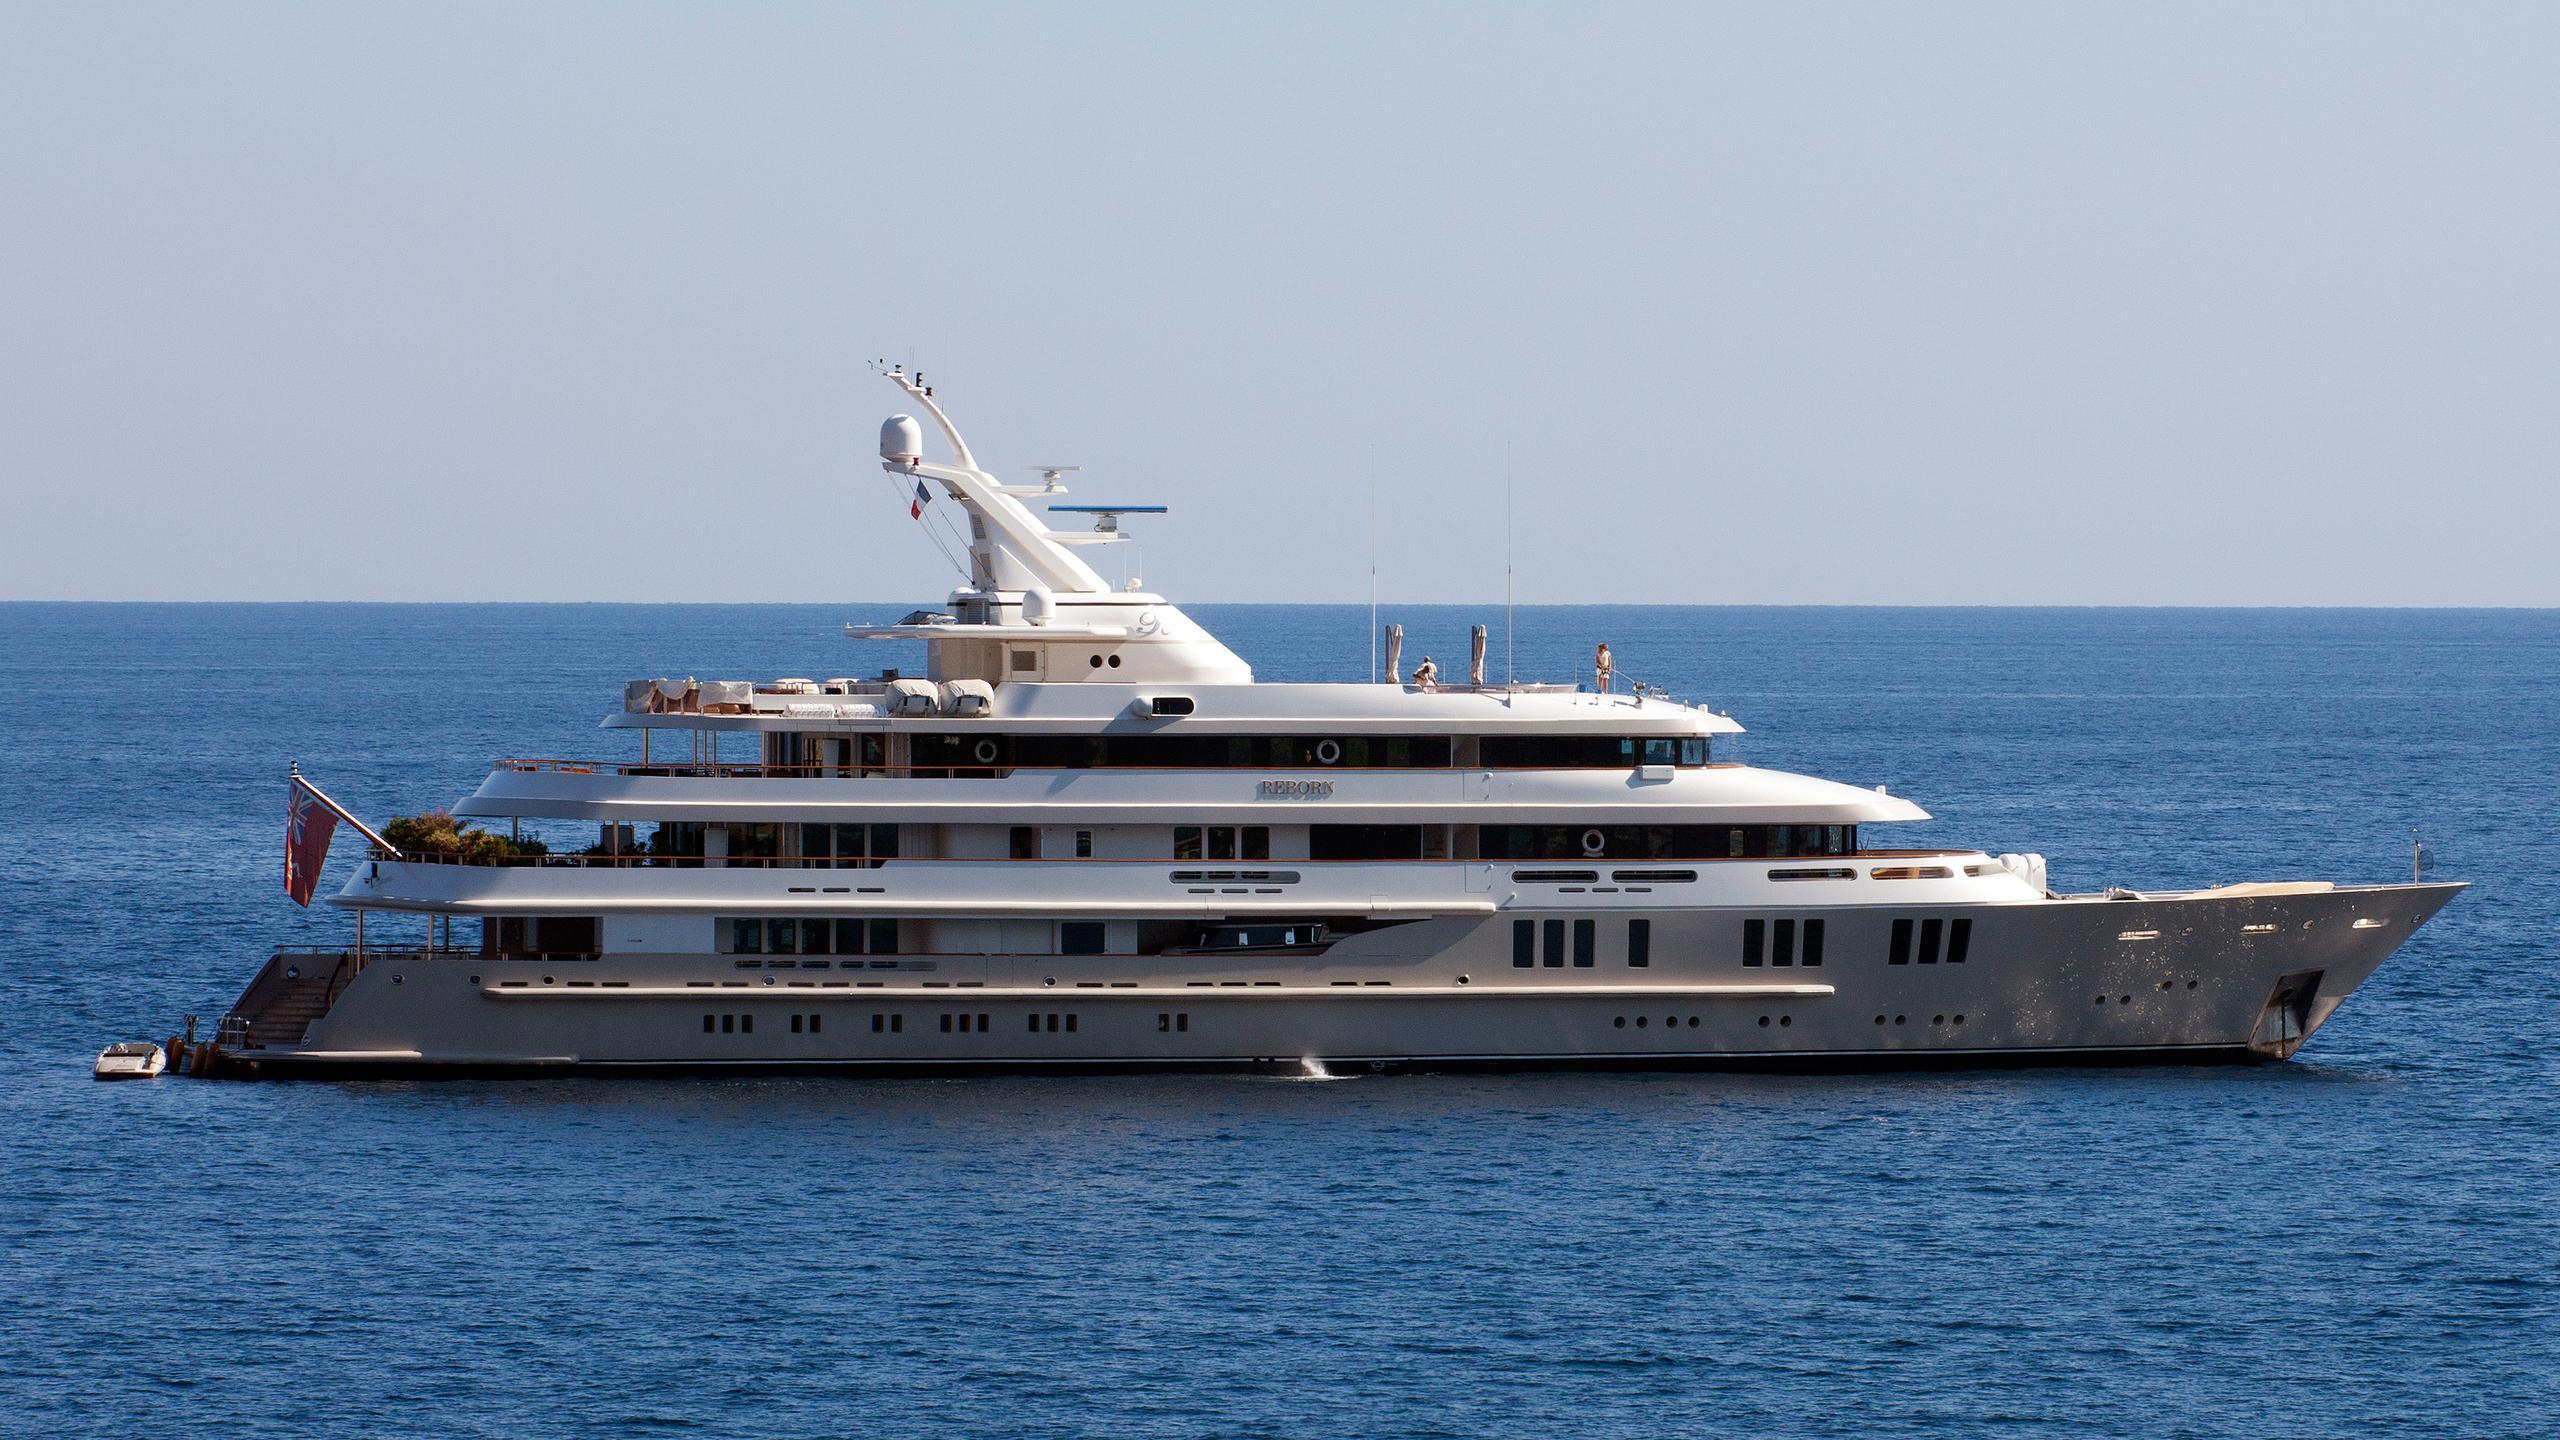 reborn-motor-yacht-amels-1999-75m-profile